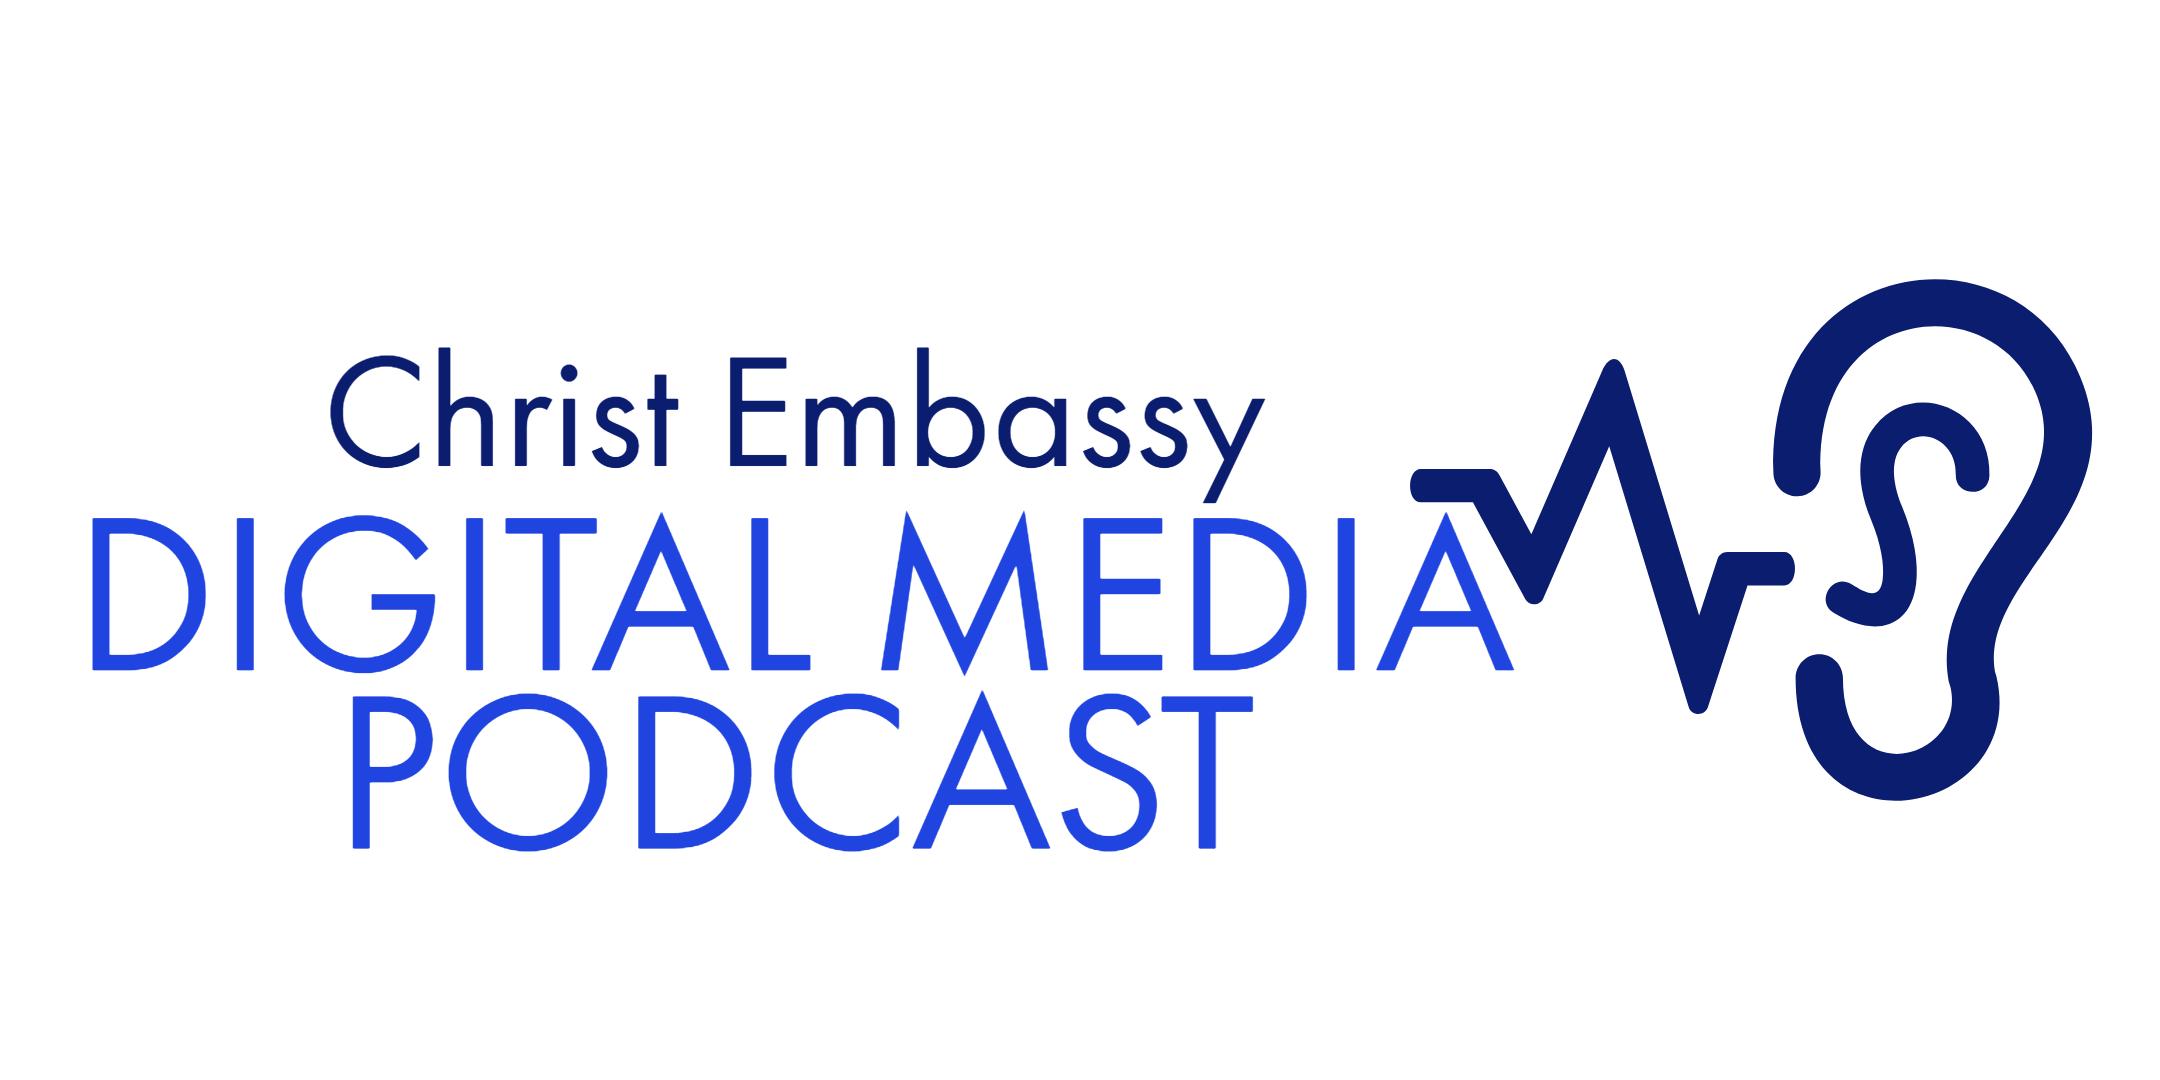 Christ Embassy Digital Media Podcast Logo